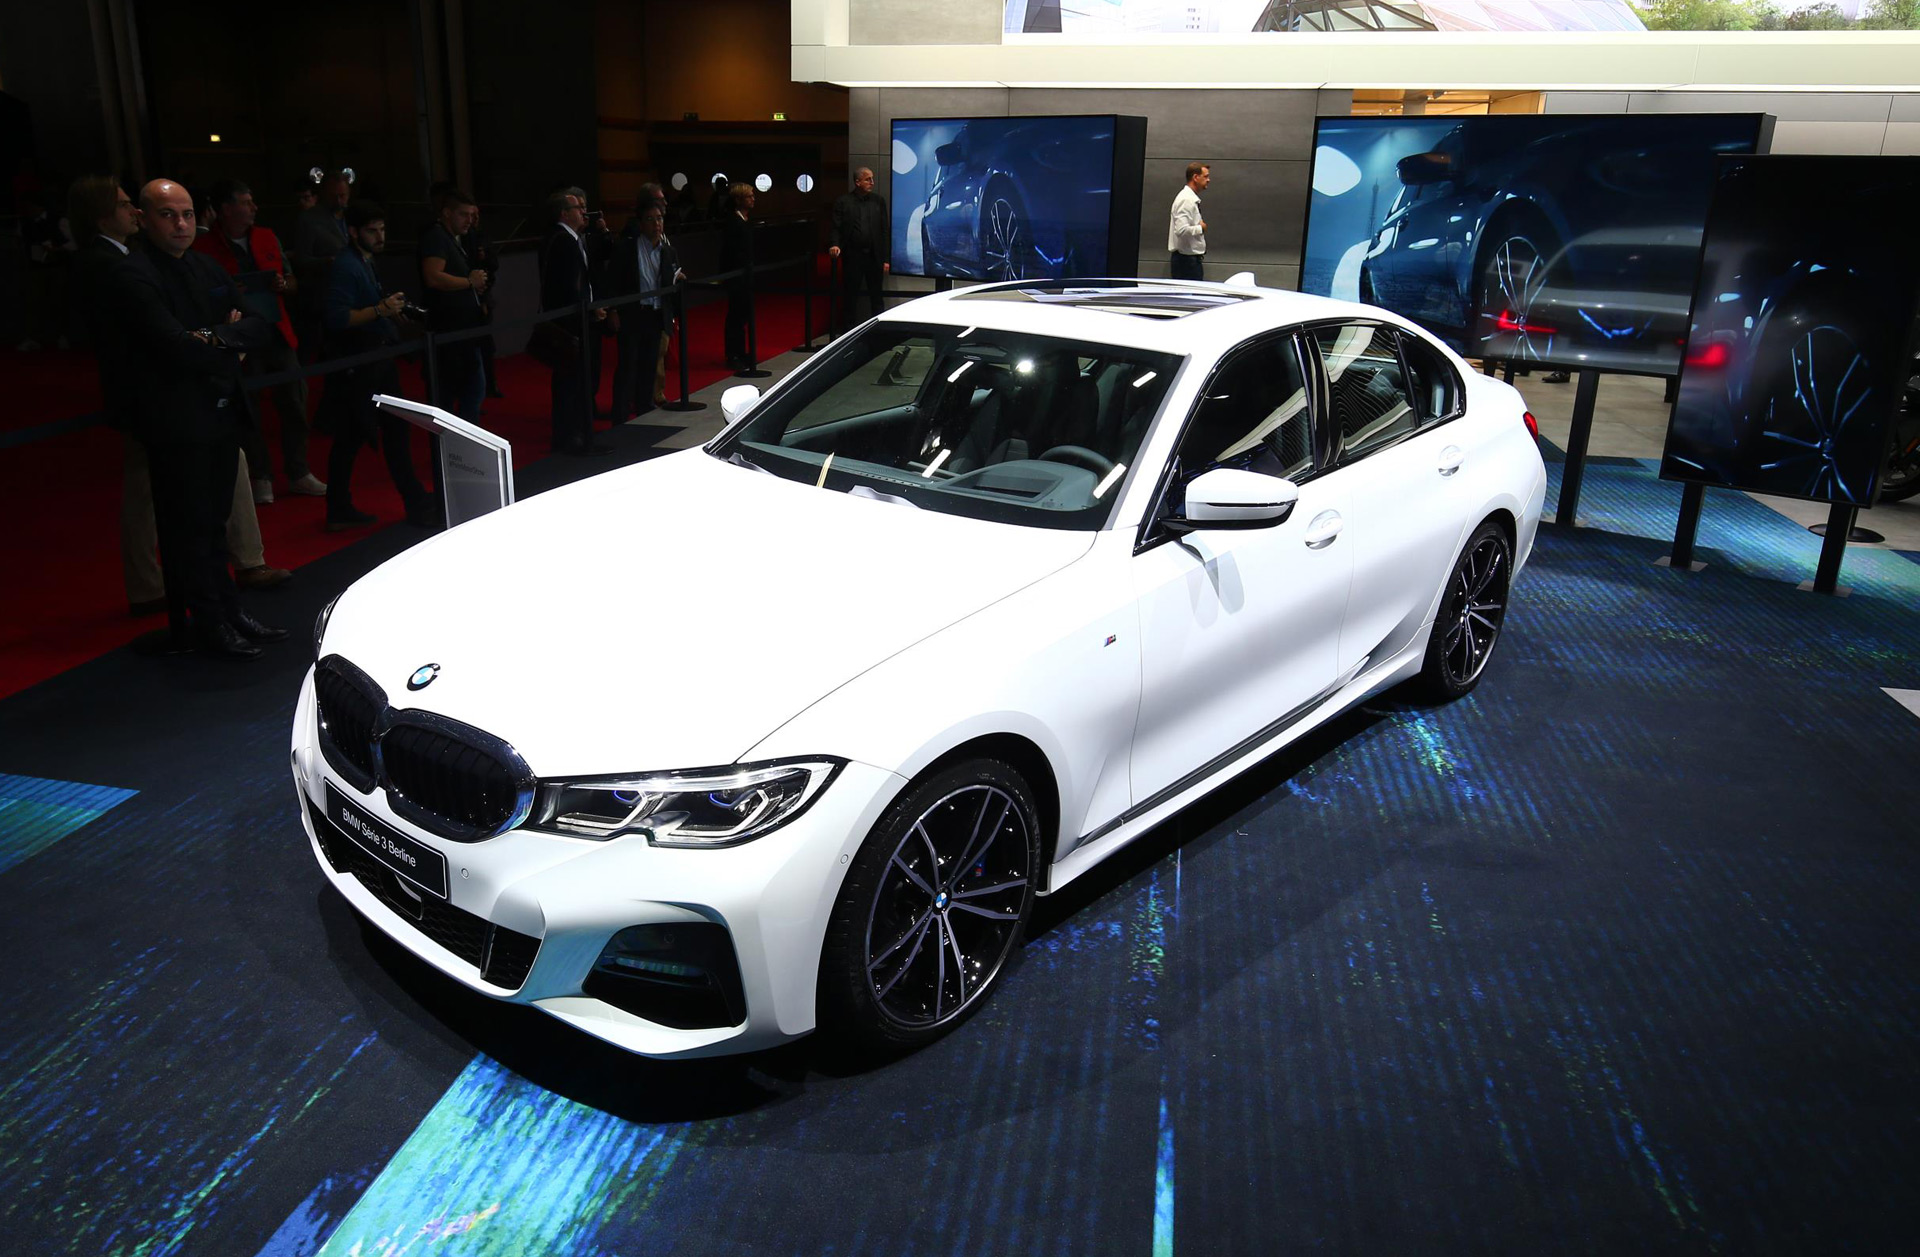 2019 Audi R8 LMS, 2019 BMW 3-Series, 2019 Mercedes-AMG A35